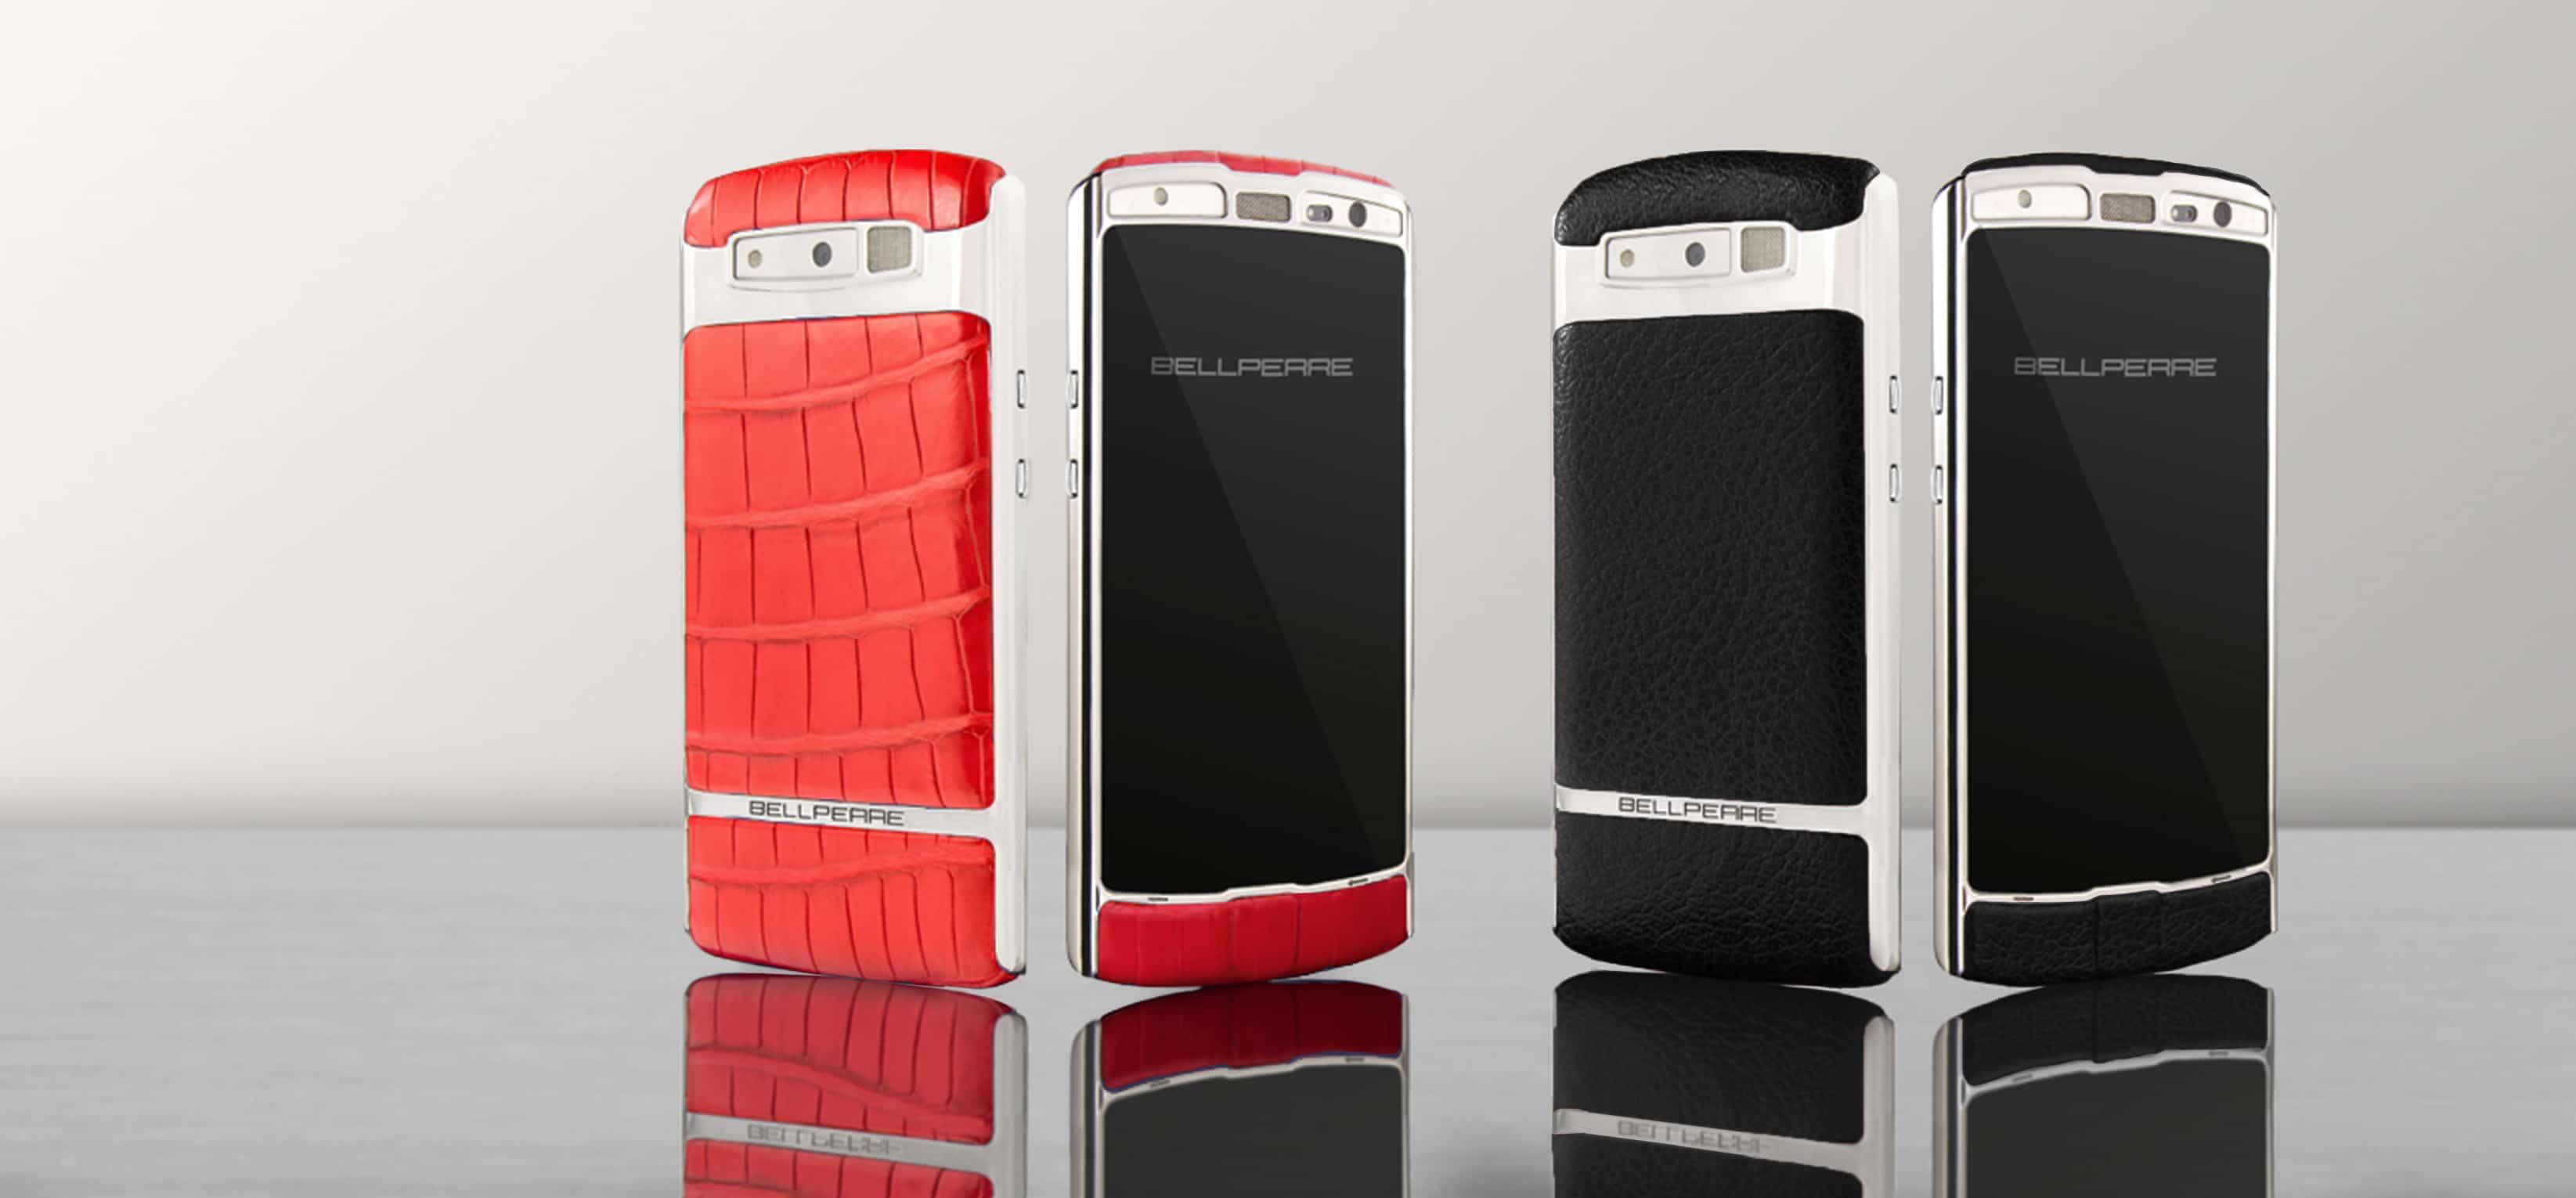 bellperre phone